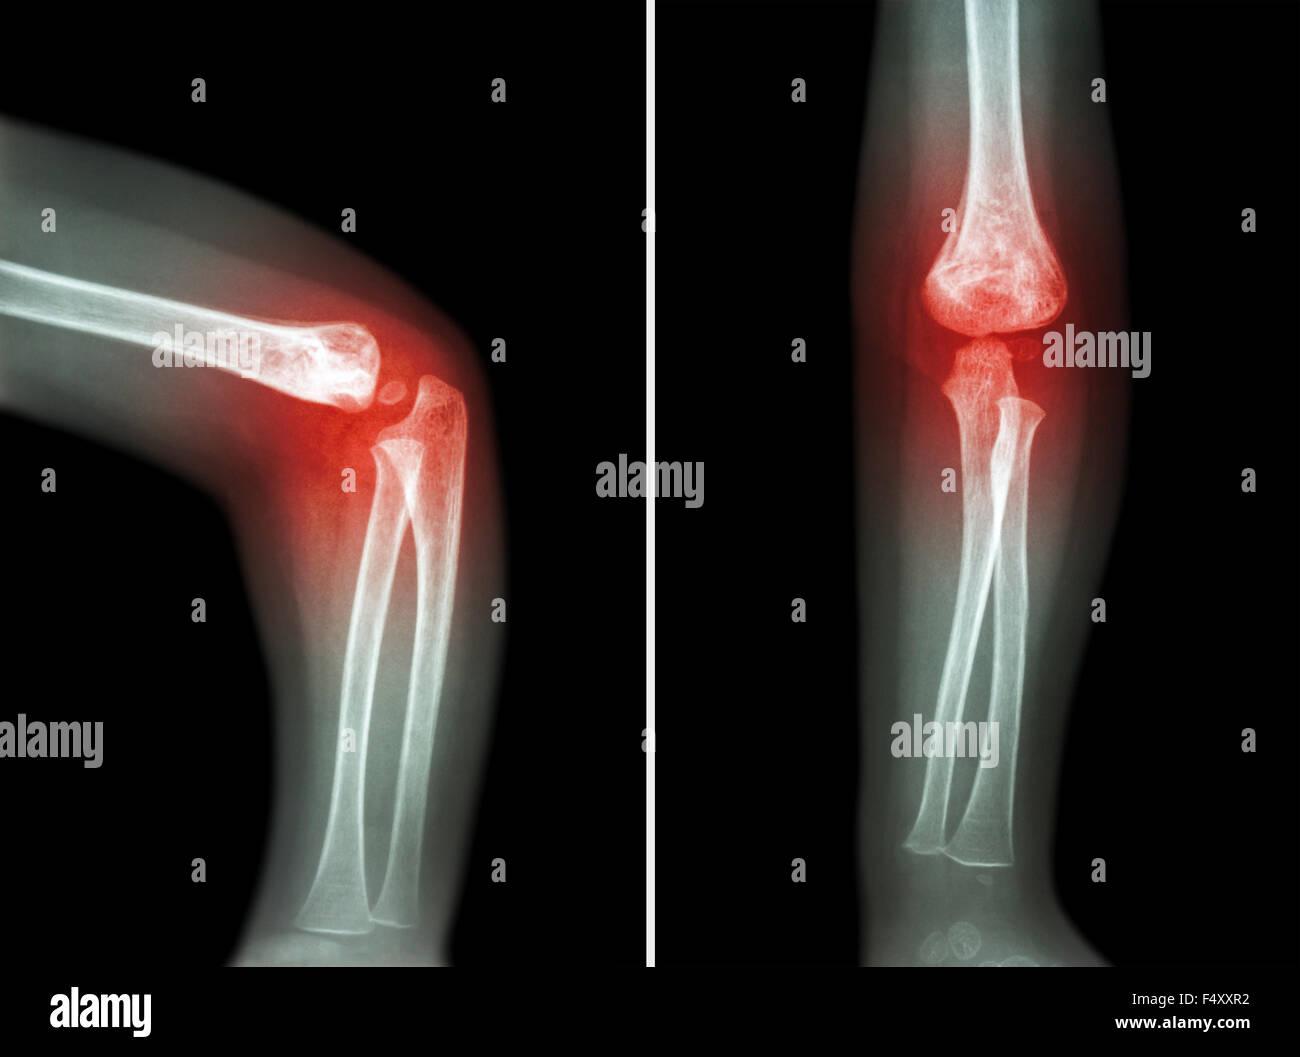 Elbow X Ray Stock Photos & Elbow X Ray Stock Images - Alamy